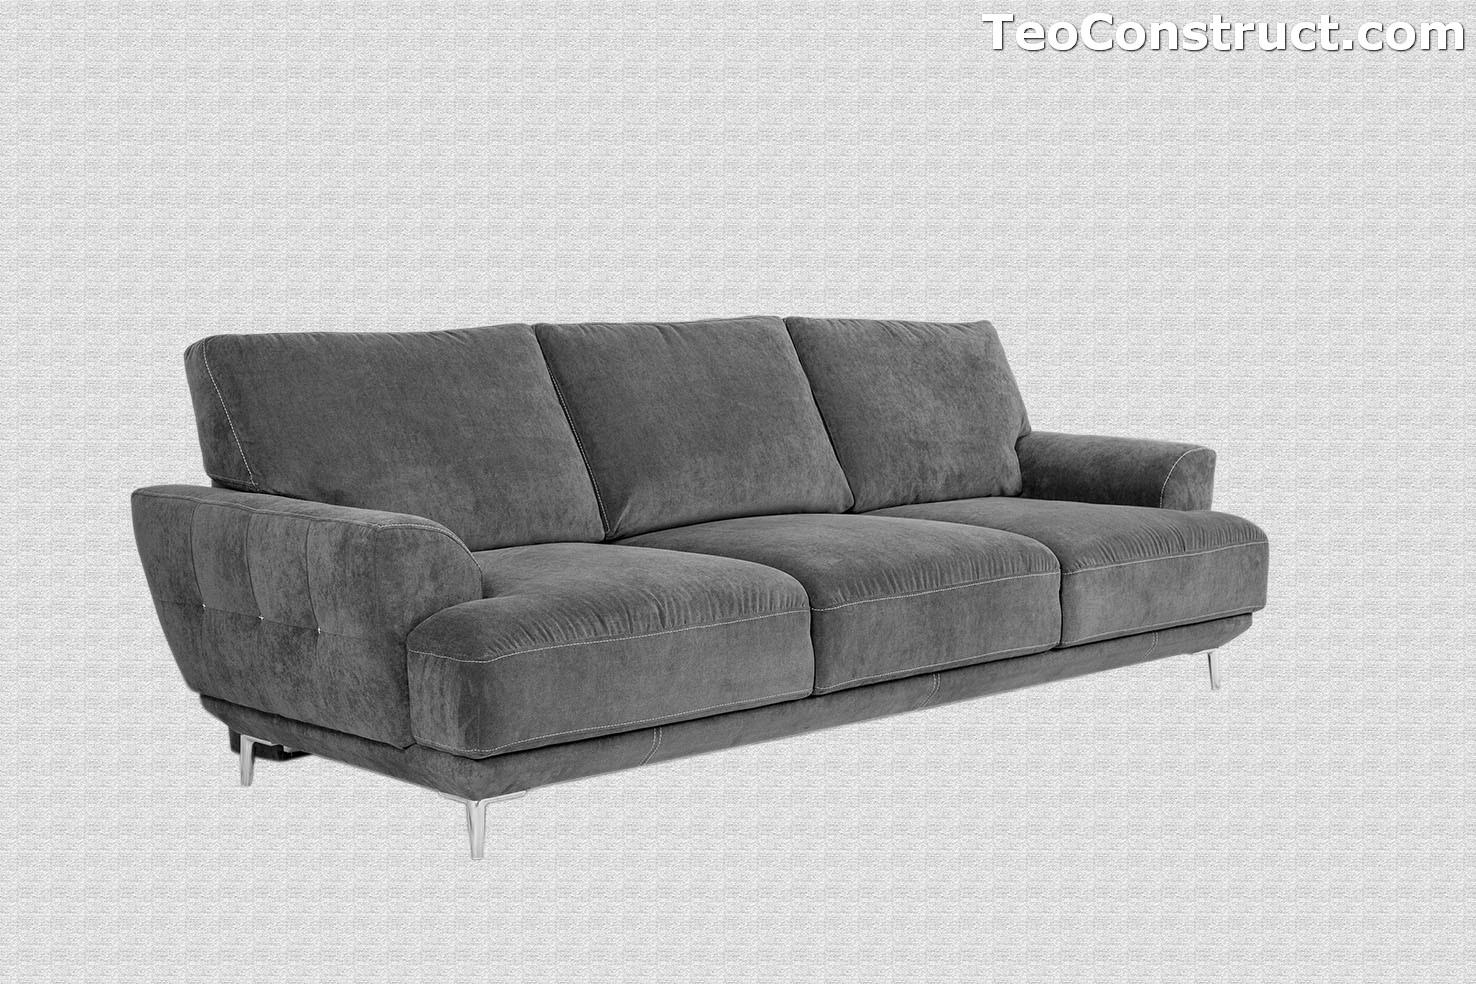 Canapea extensibila Boston pentru casa 8